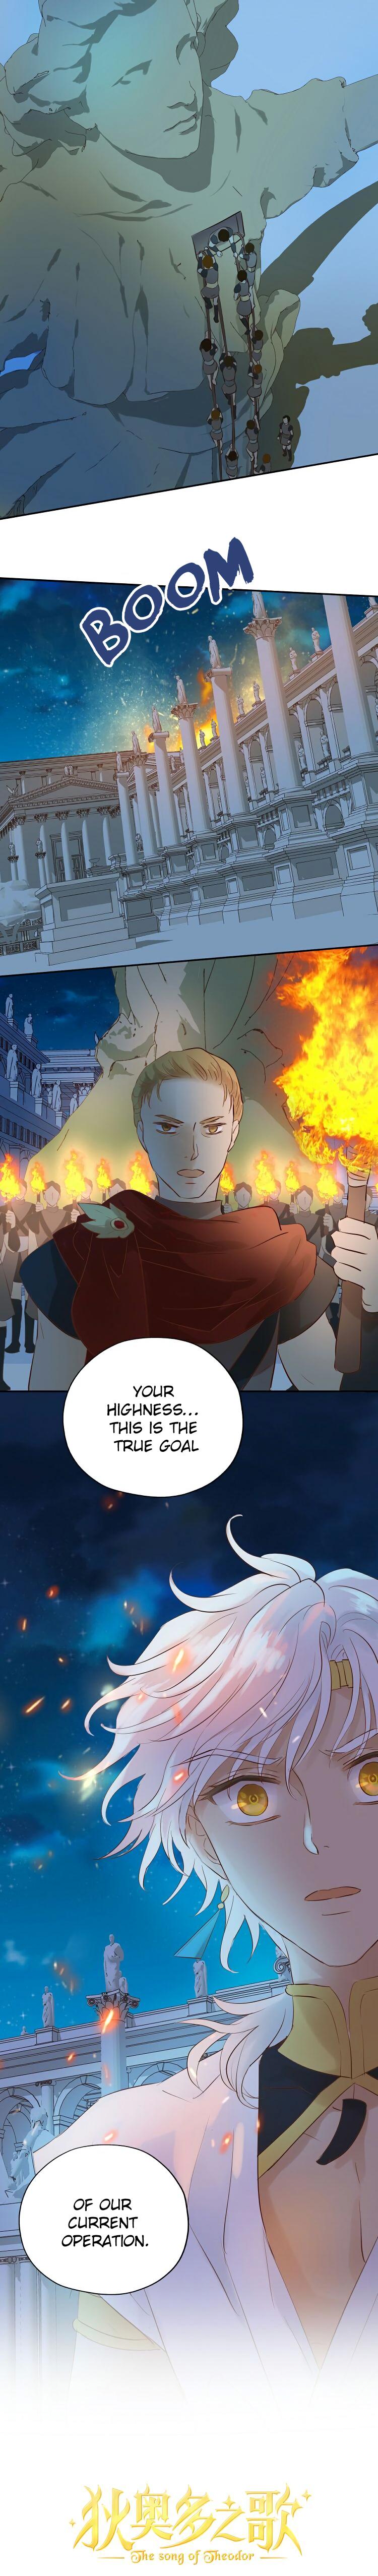 https://img2.nineanime.com/comics/pic4/47/34031/1663129/0044deeec43ded19b952125079eb1781.jpg Page 1